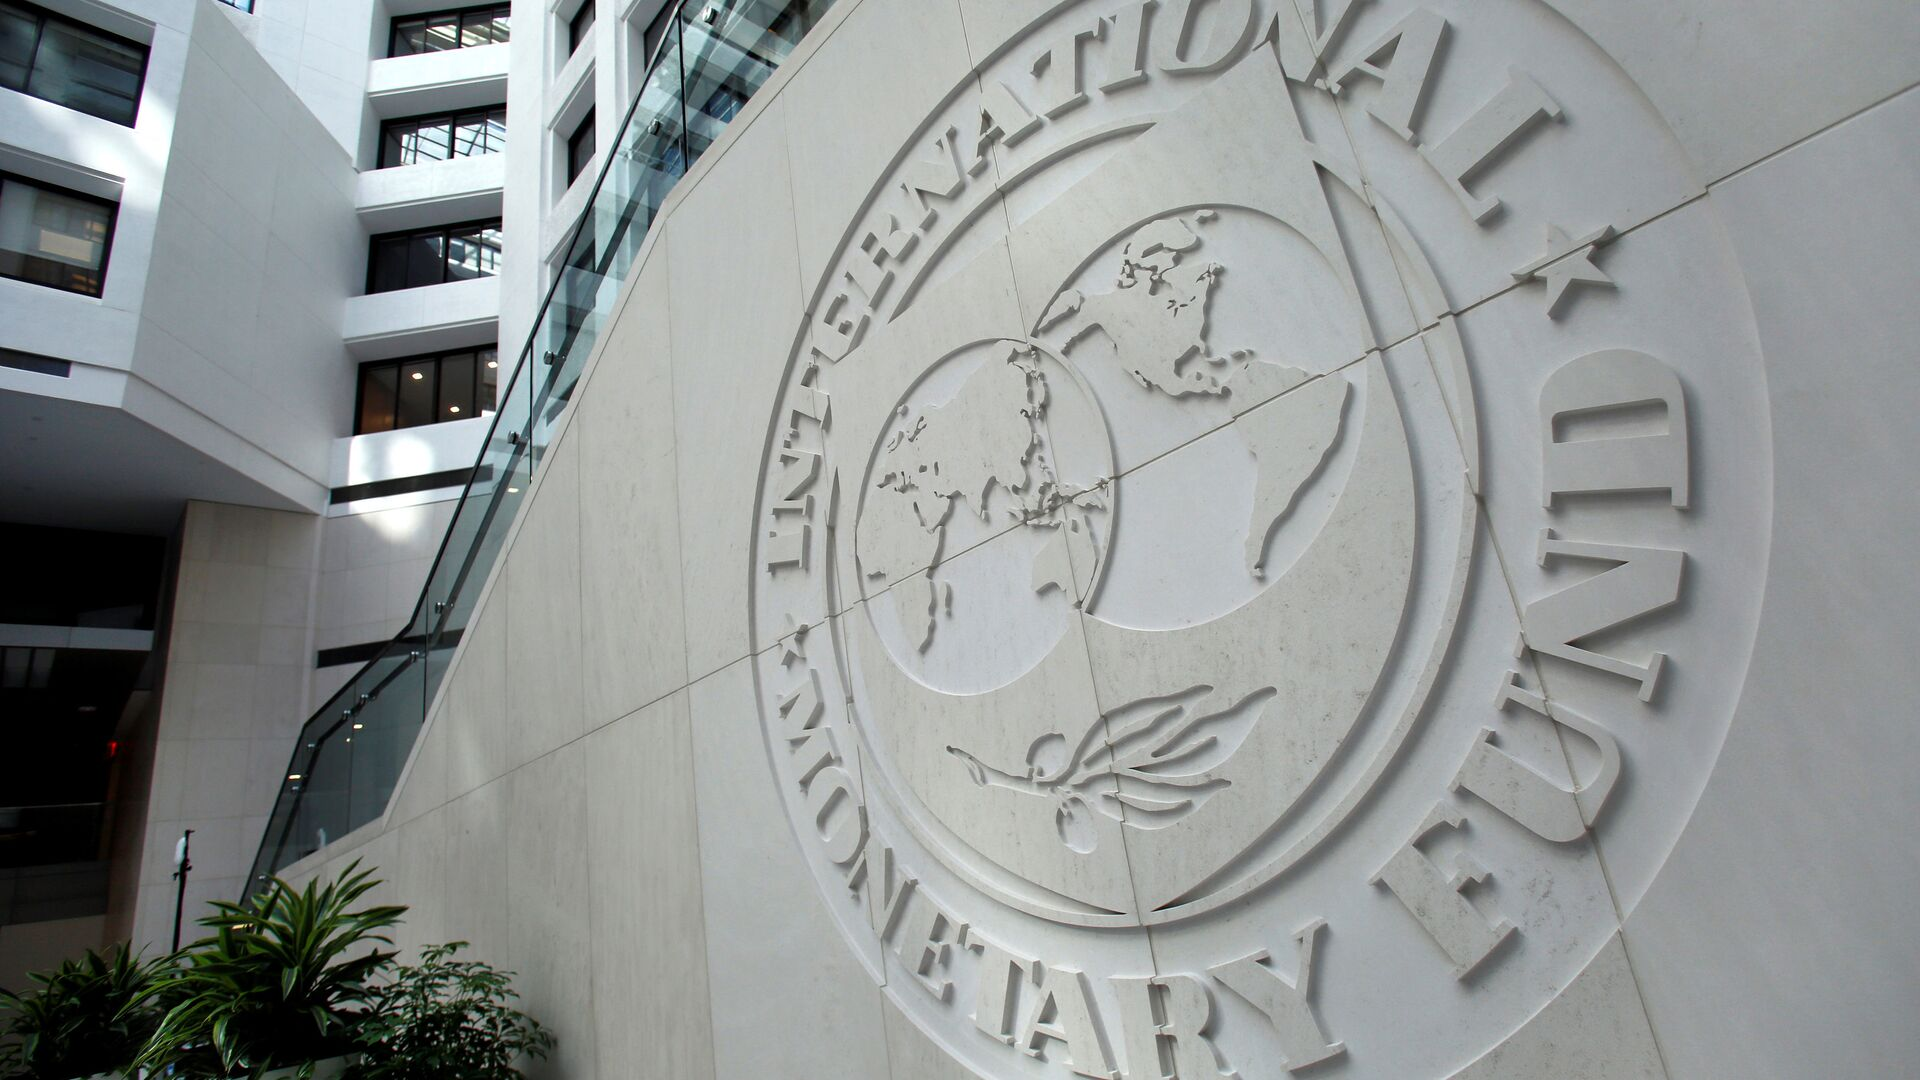 La sede del Fondo Monetario Internazionale - Sputnik Italia, 1920, 09.07.2021